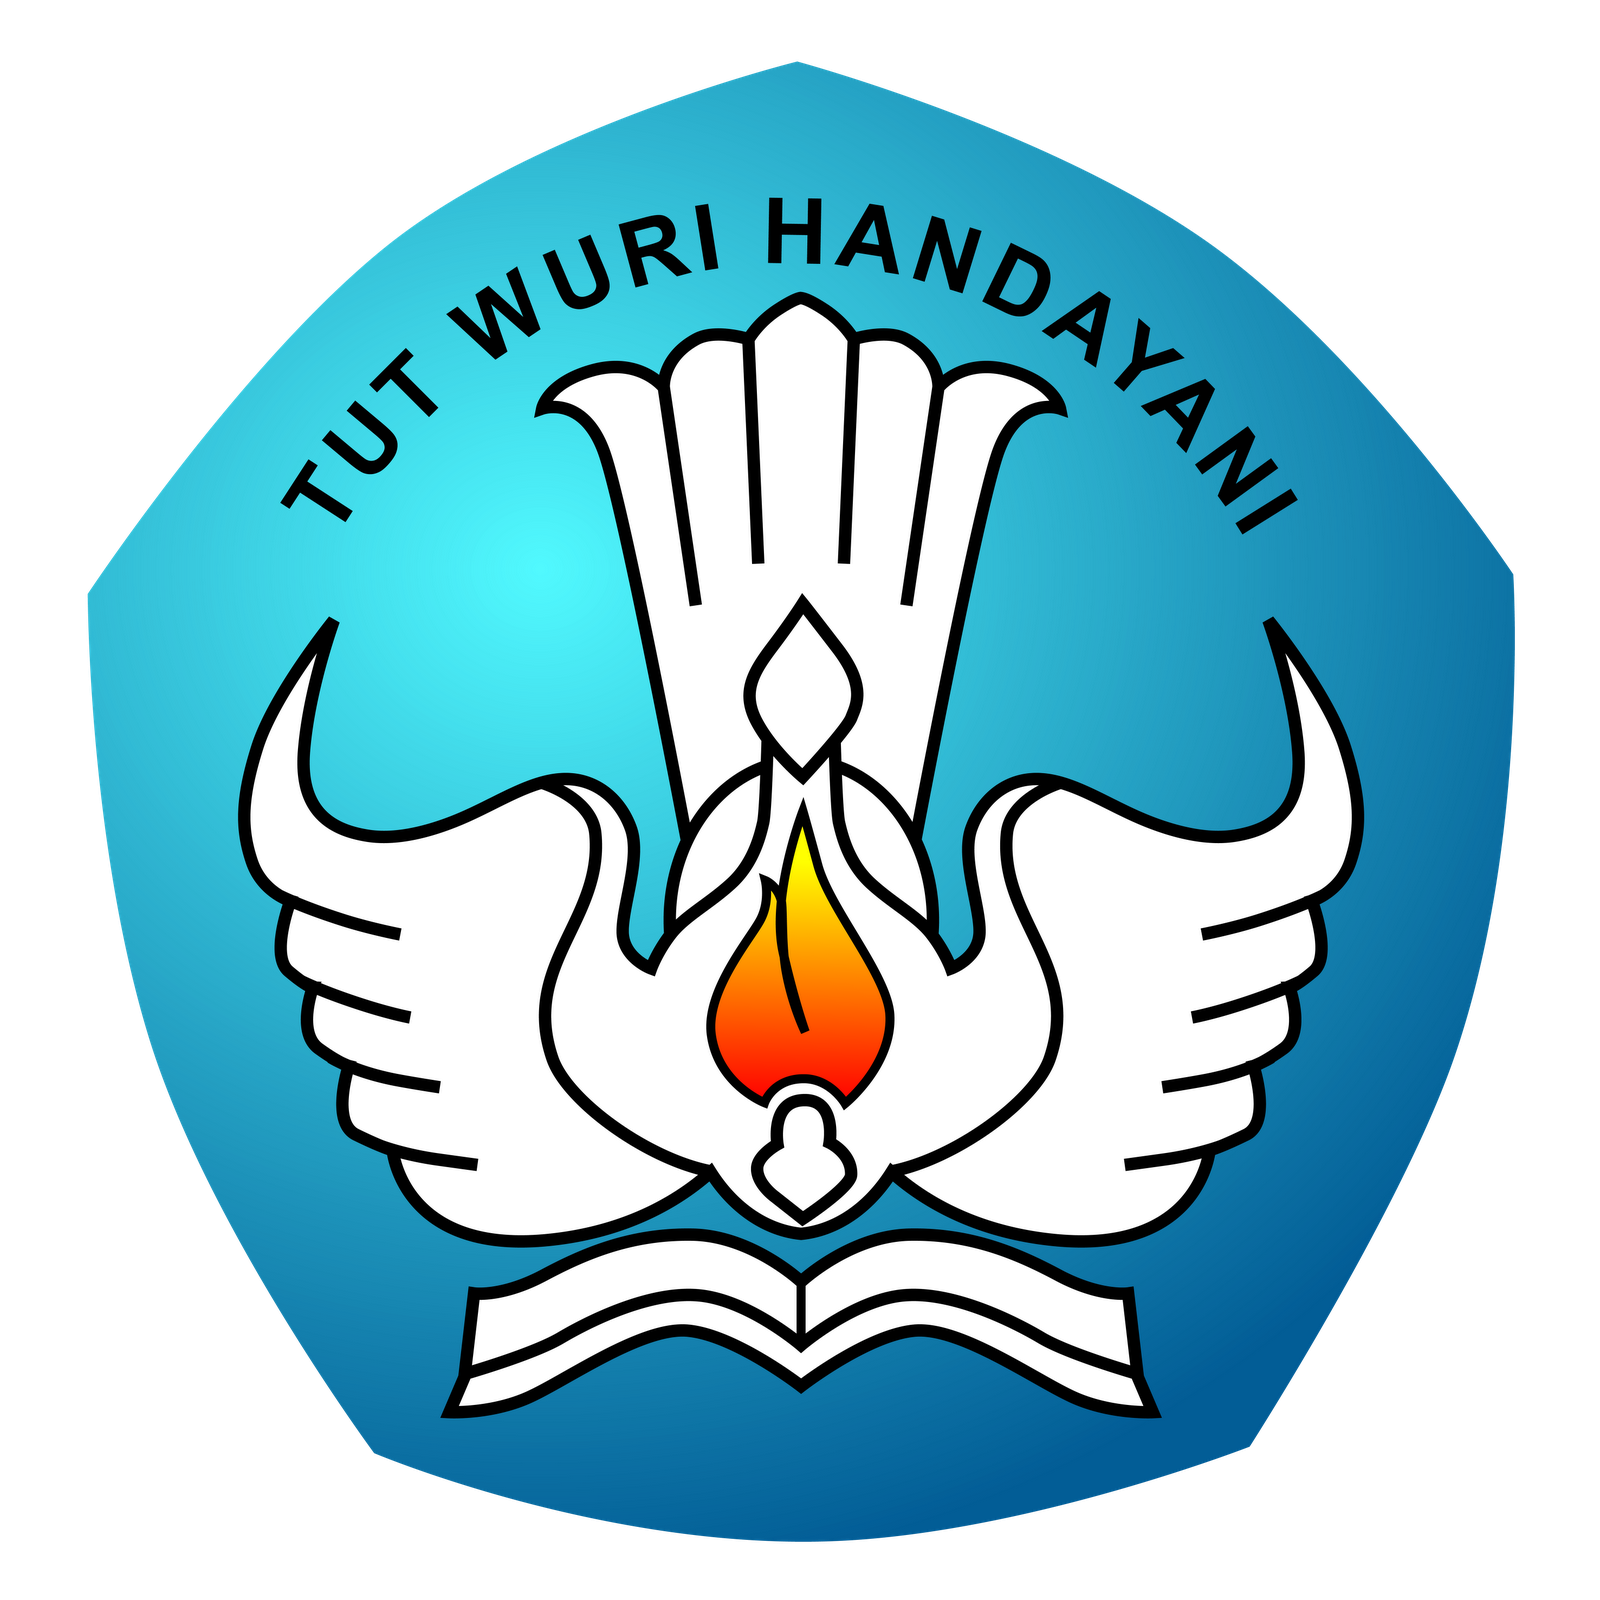 Mei 2013 di Kabupaten Jember jumlah Sekolah Menengah Kejuruan (SMK